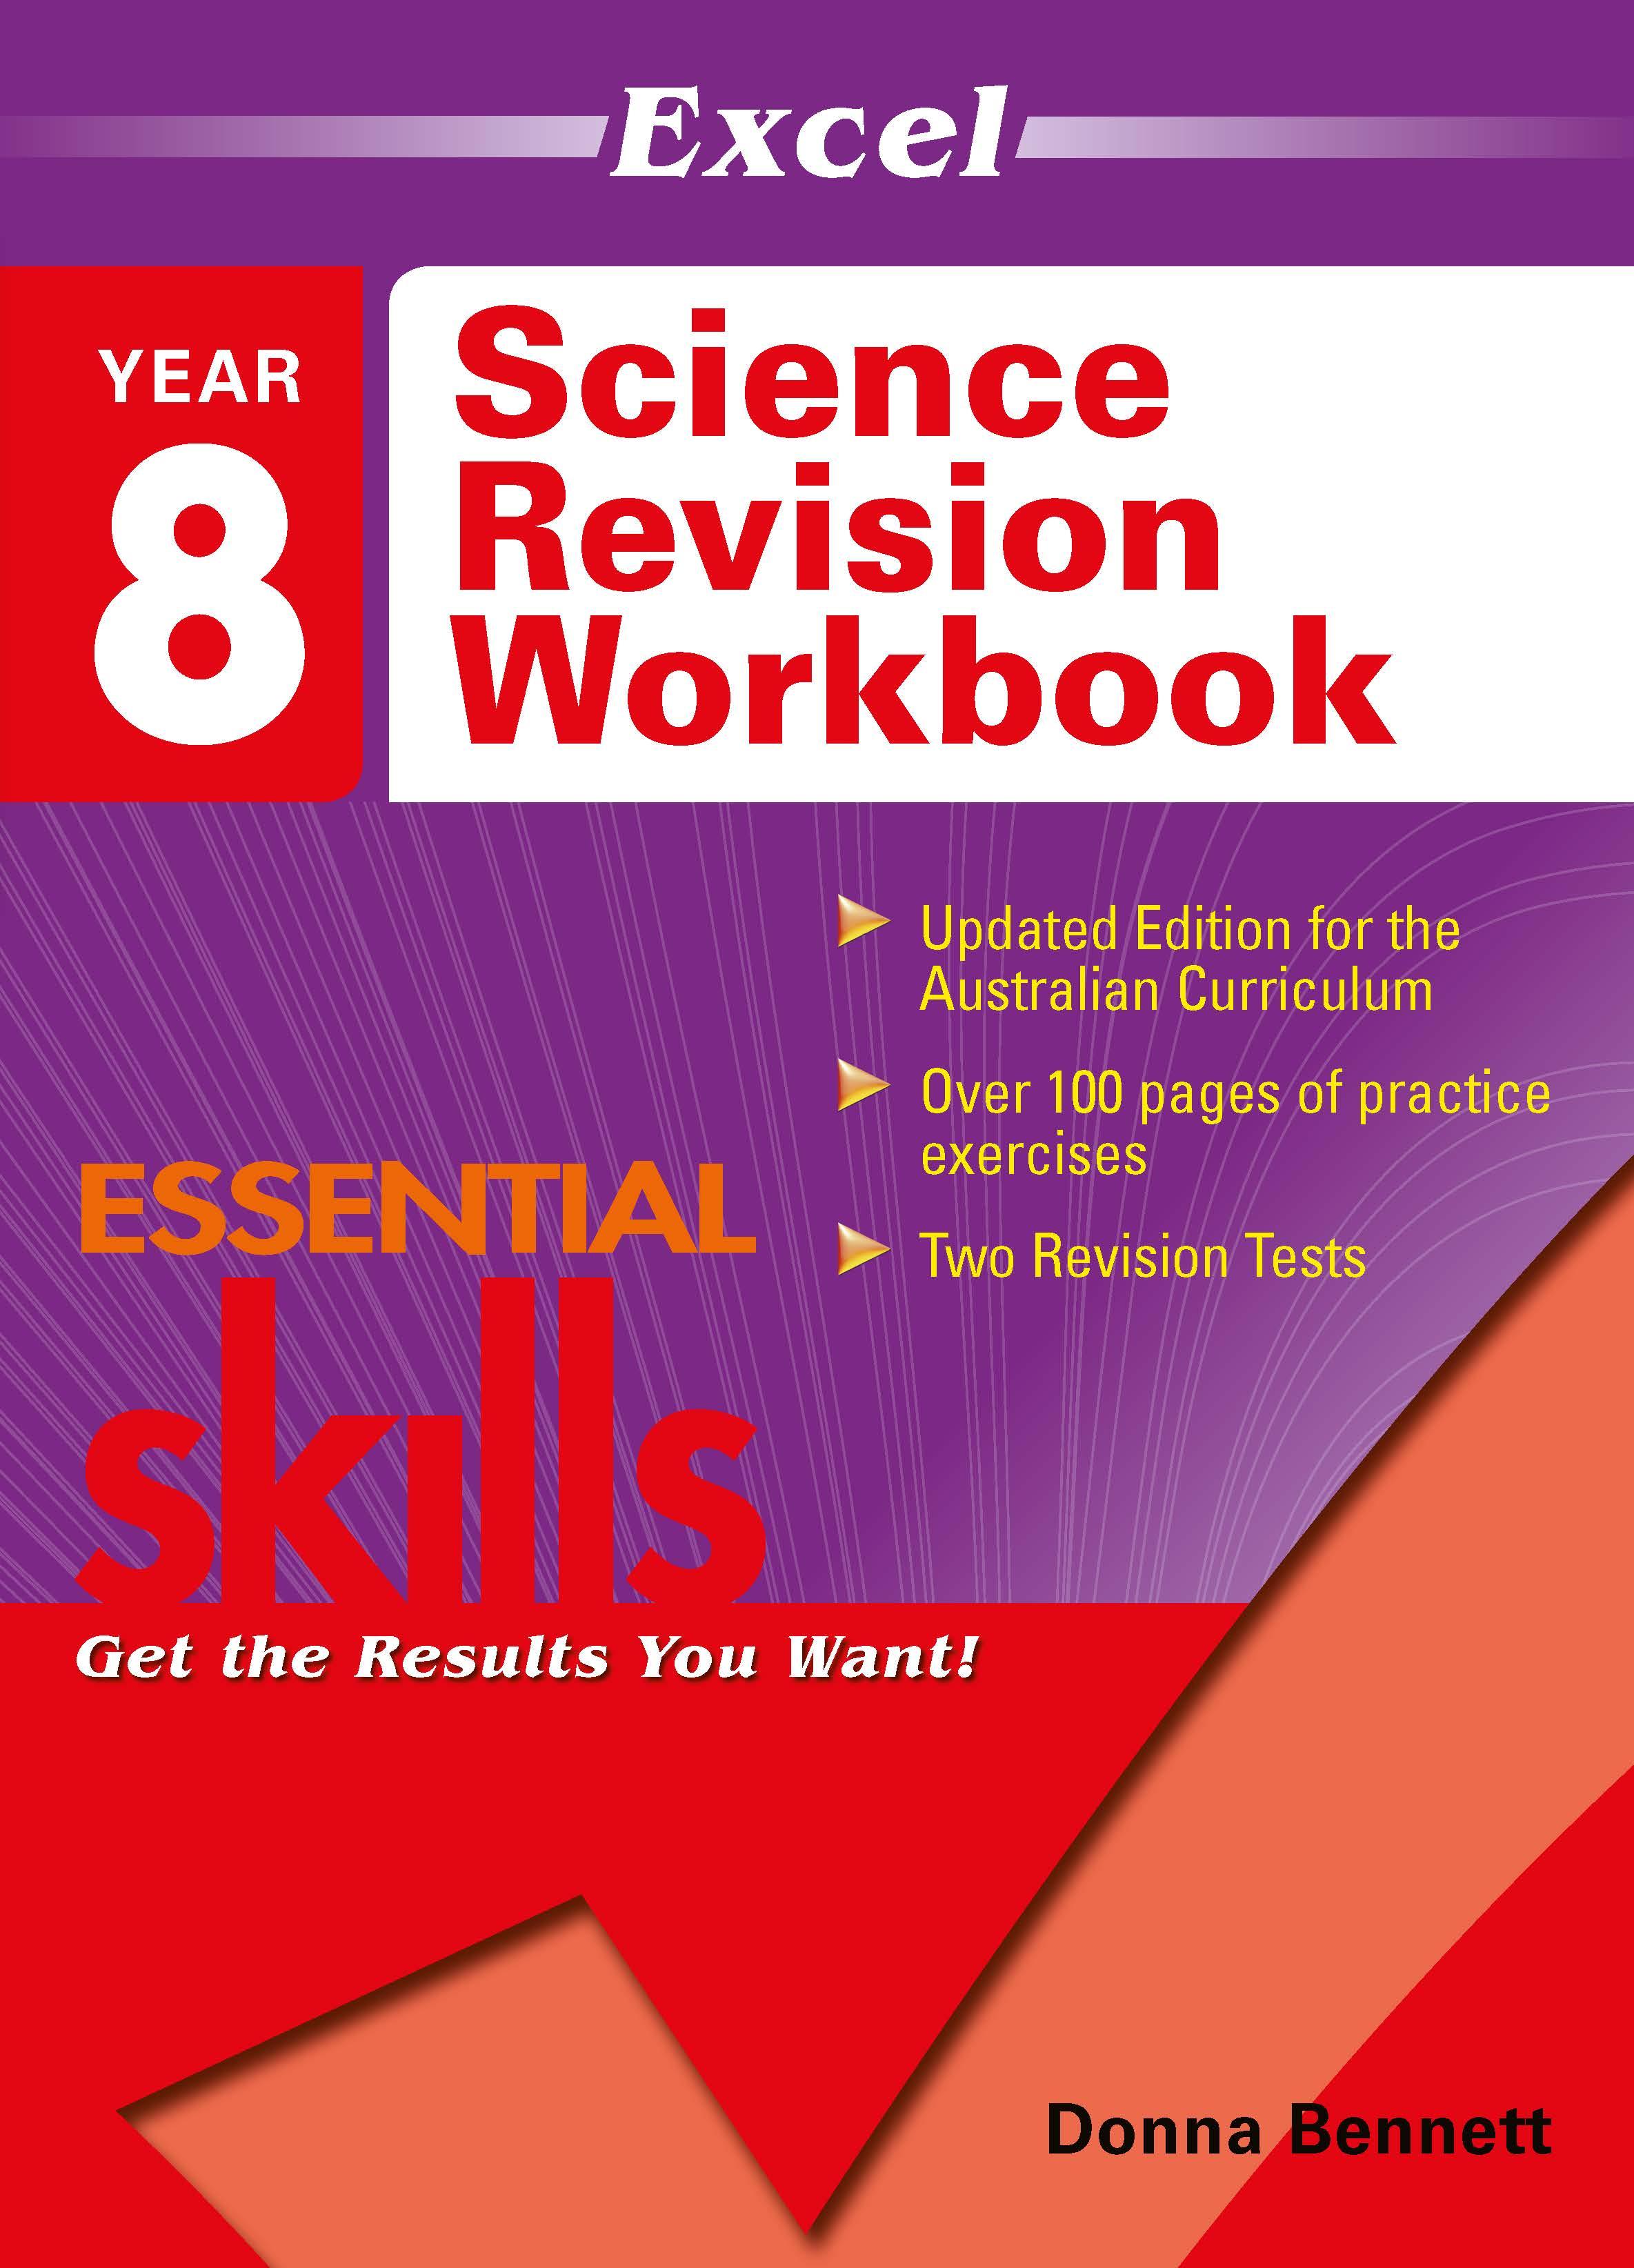 Excel Essential Skills: Science Revision Workbook Year 8